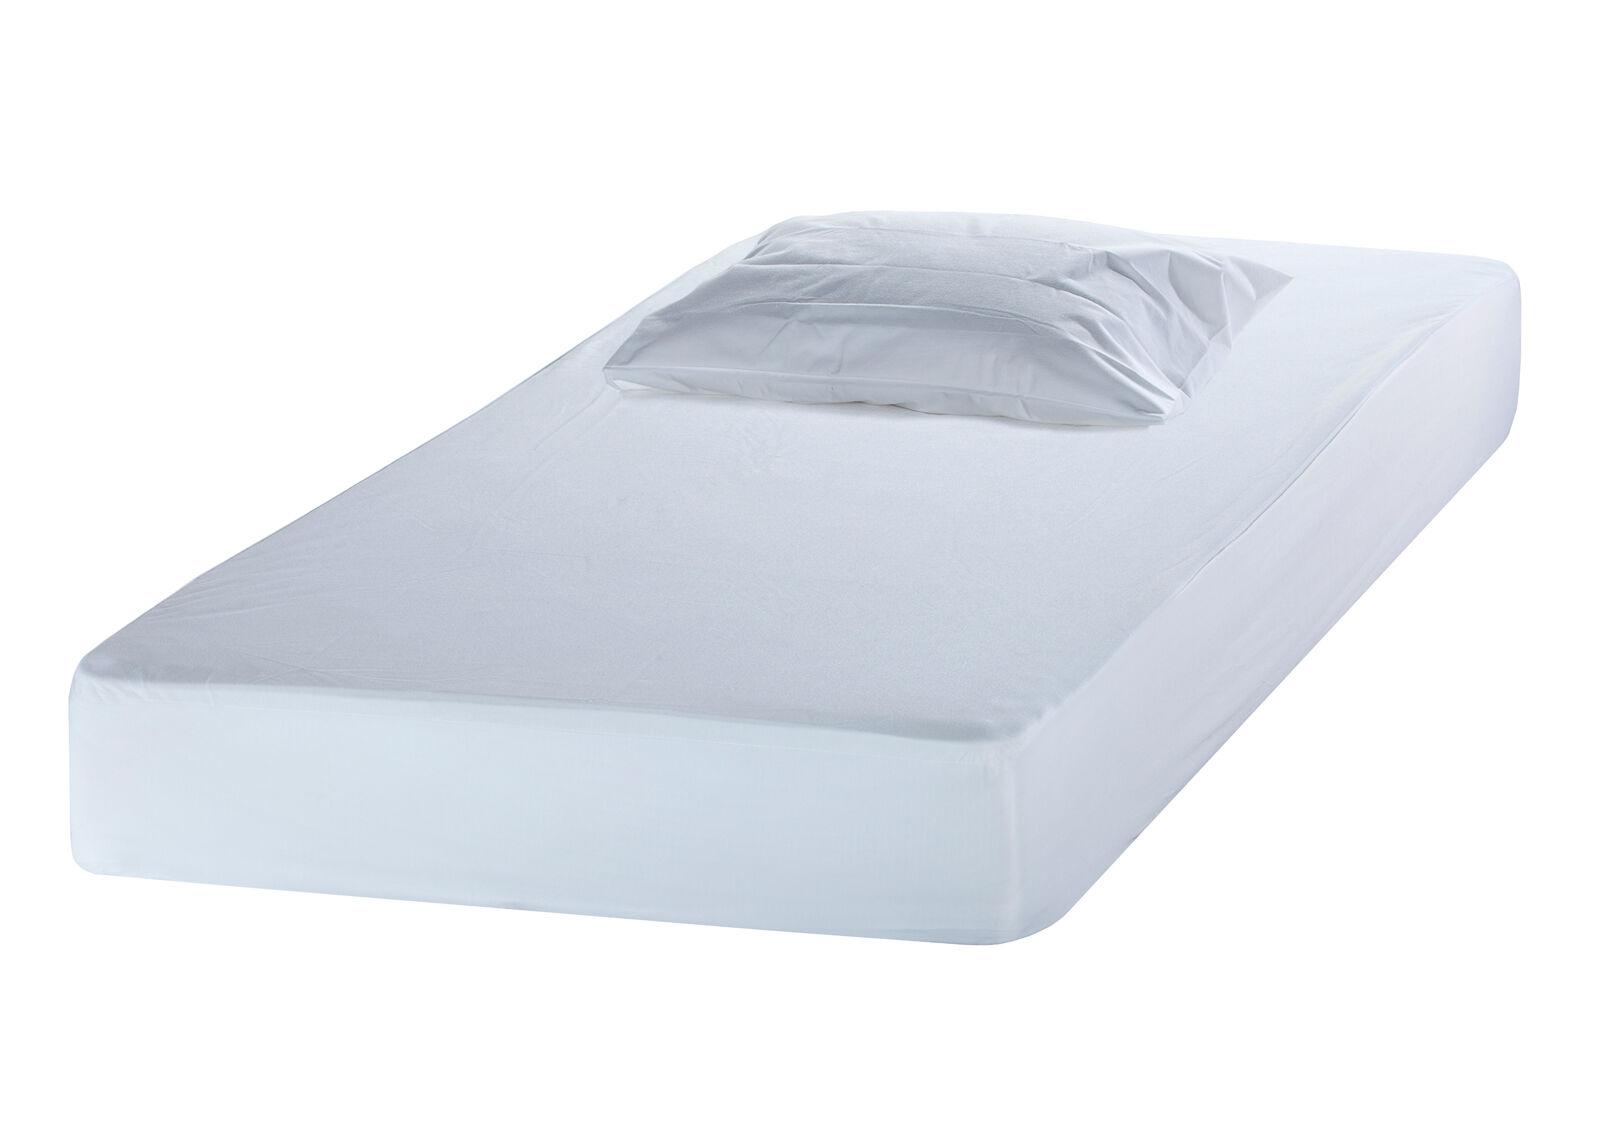 Sleepwell petauspatjan suojalakana Daggkapa 80x200 cm